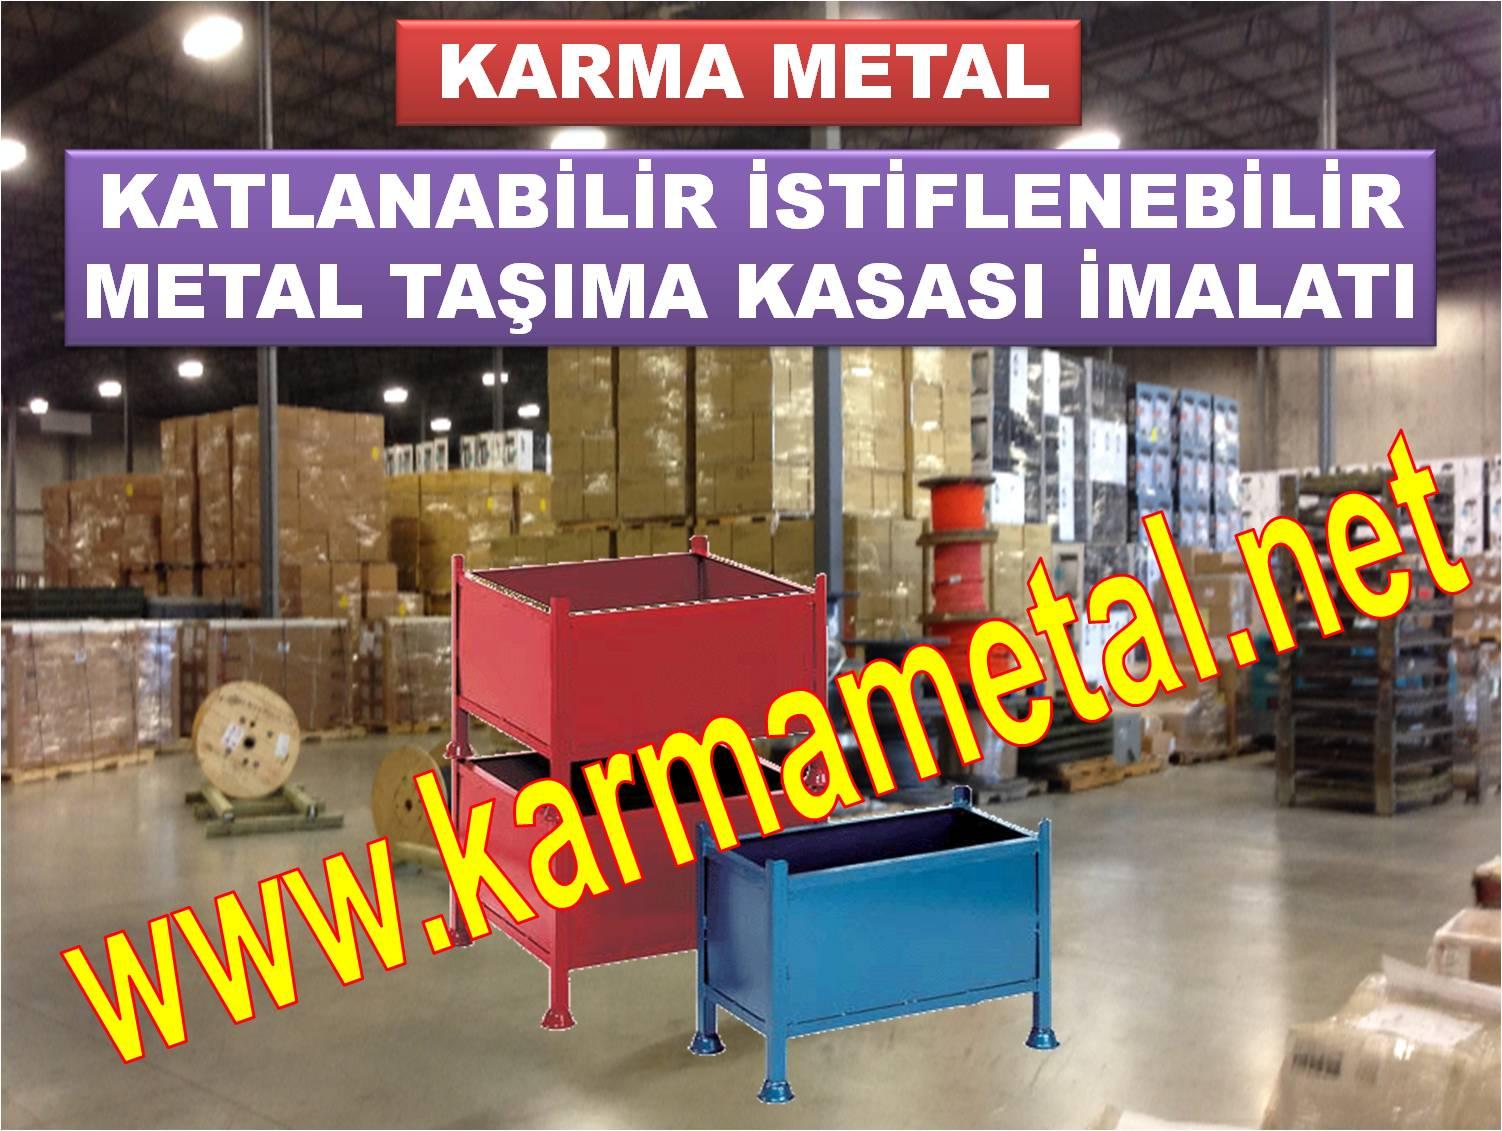 katlanabilir_istiflenebilir_metal_tasima_kasasi_sevkiyat_kasalari_istanbul (2)